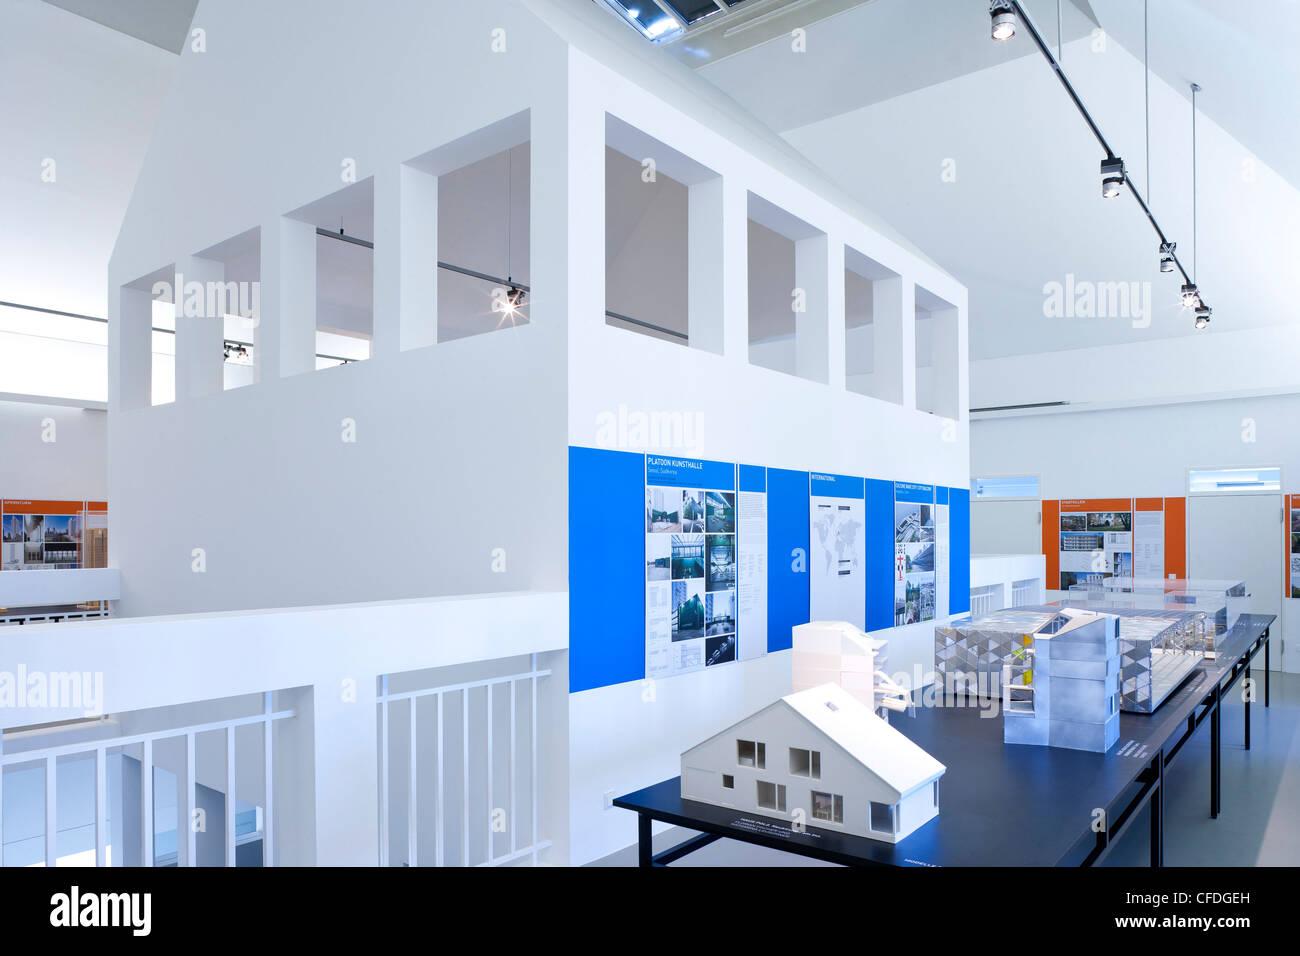 Deutsches Architekturmuseum, architect O M  Ungers, Frankfurt am Main, Hesse, Germany, Europe - Stock Image